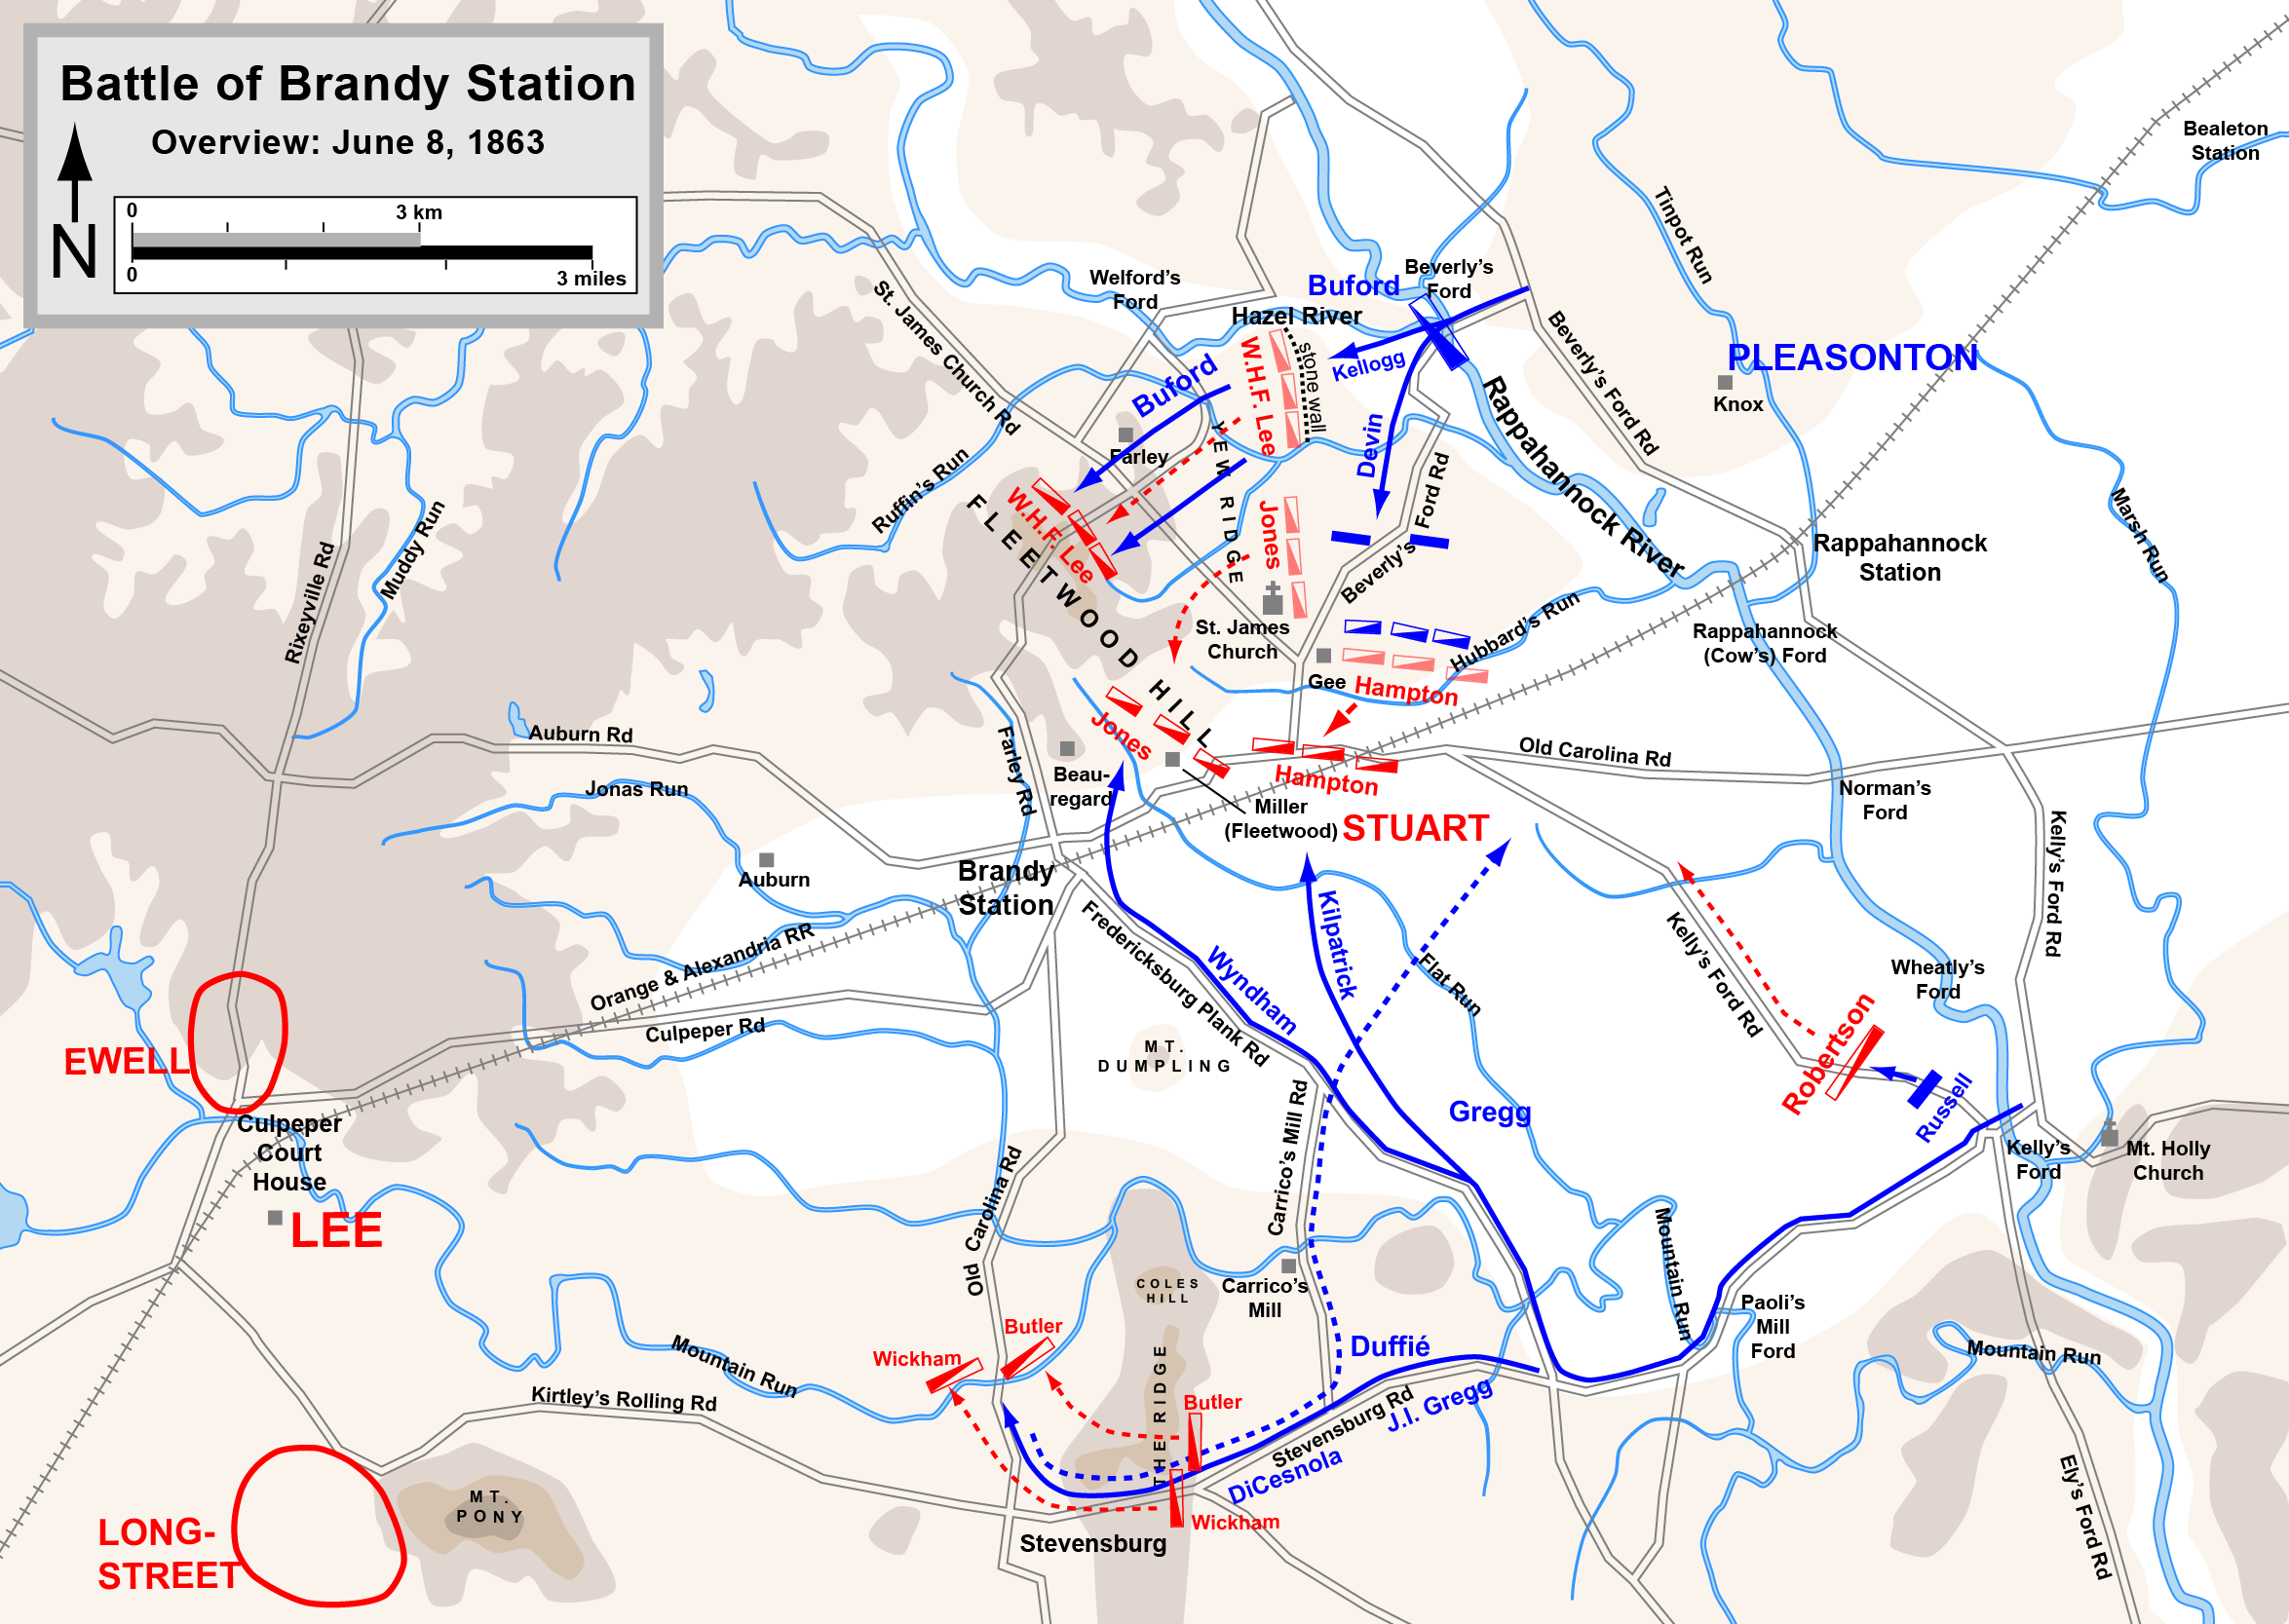 Gettysburg Wheatfield Google Search Gettysburg Campaign And - Battle of gettysburg us map